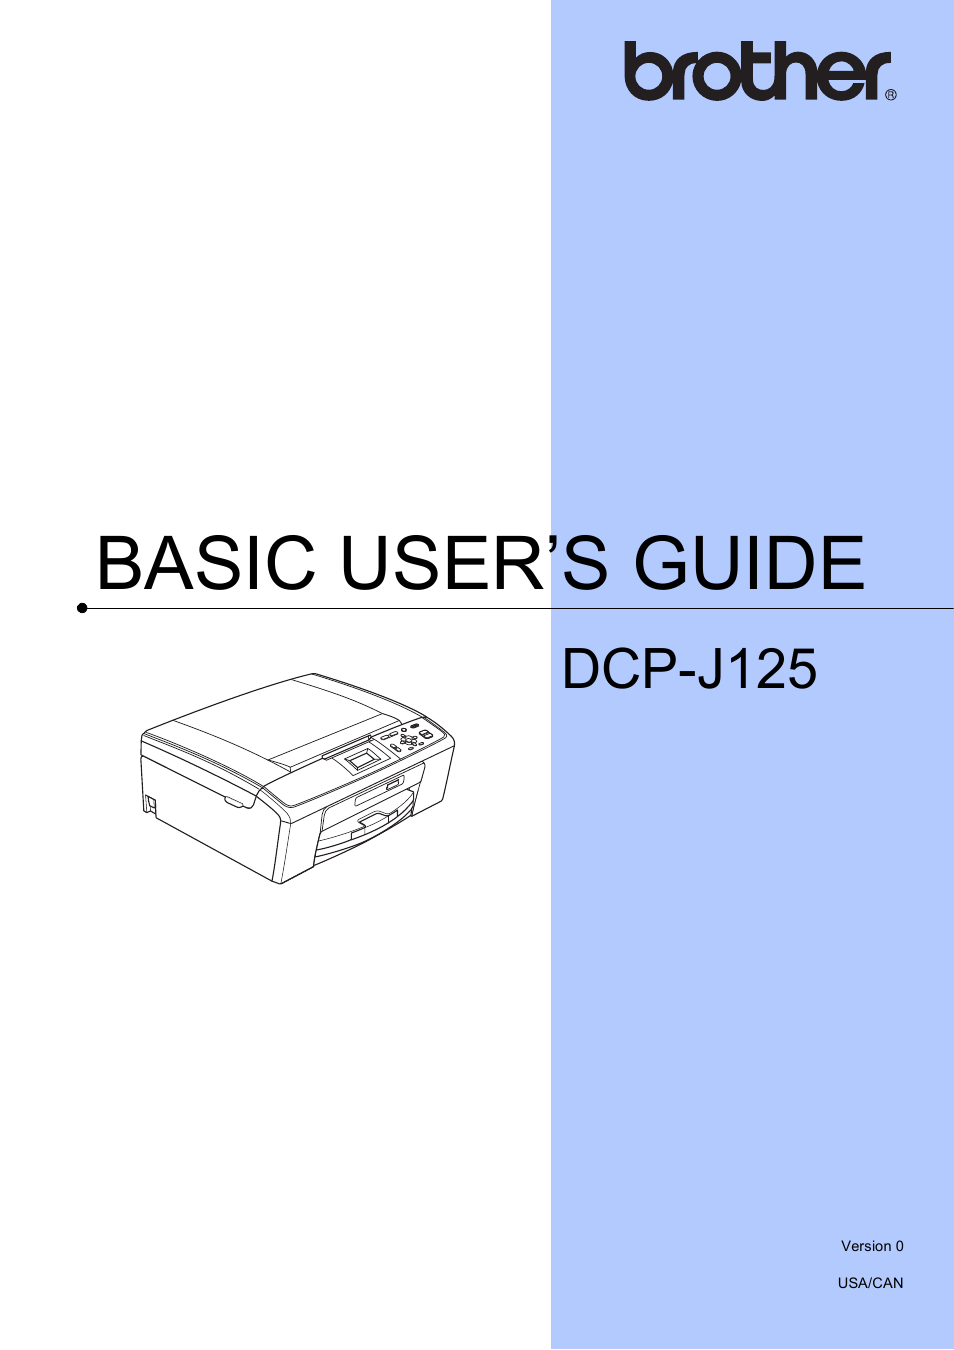 brother dcp j125 user manual 83 pages rh manualsdir com brother dcp j125 service manual brother dcp-j125 printer manual